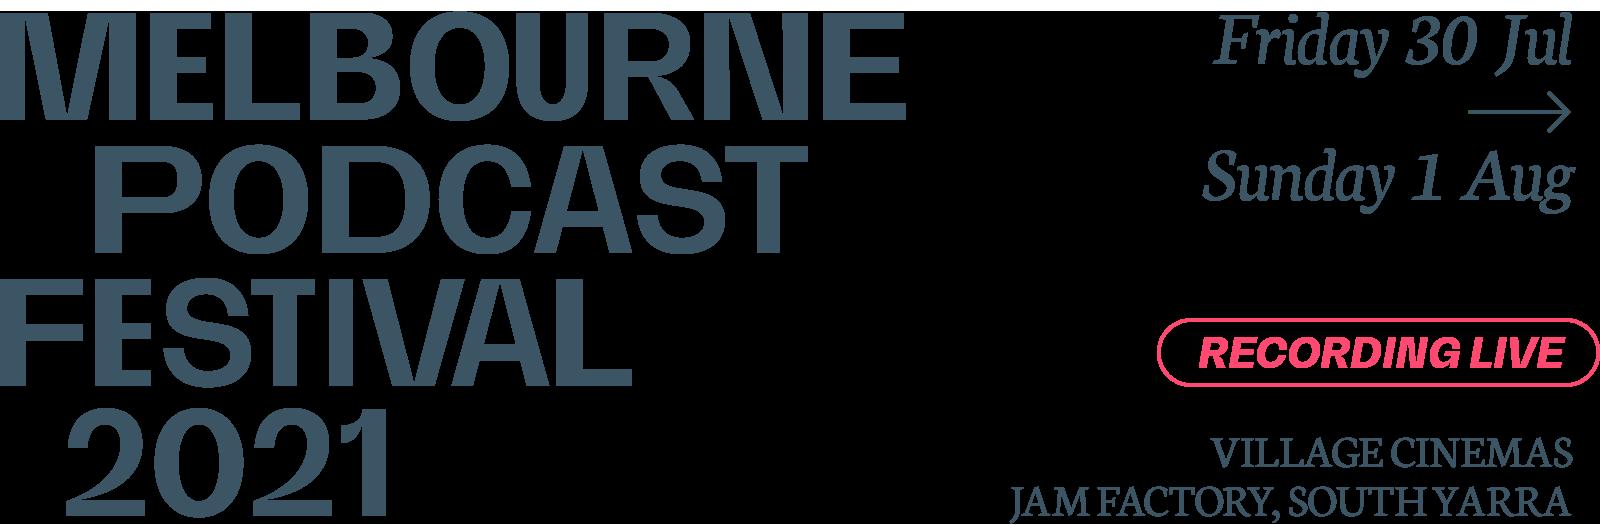 Melbourne Podcast Festival 2021